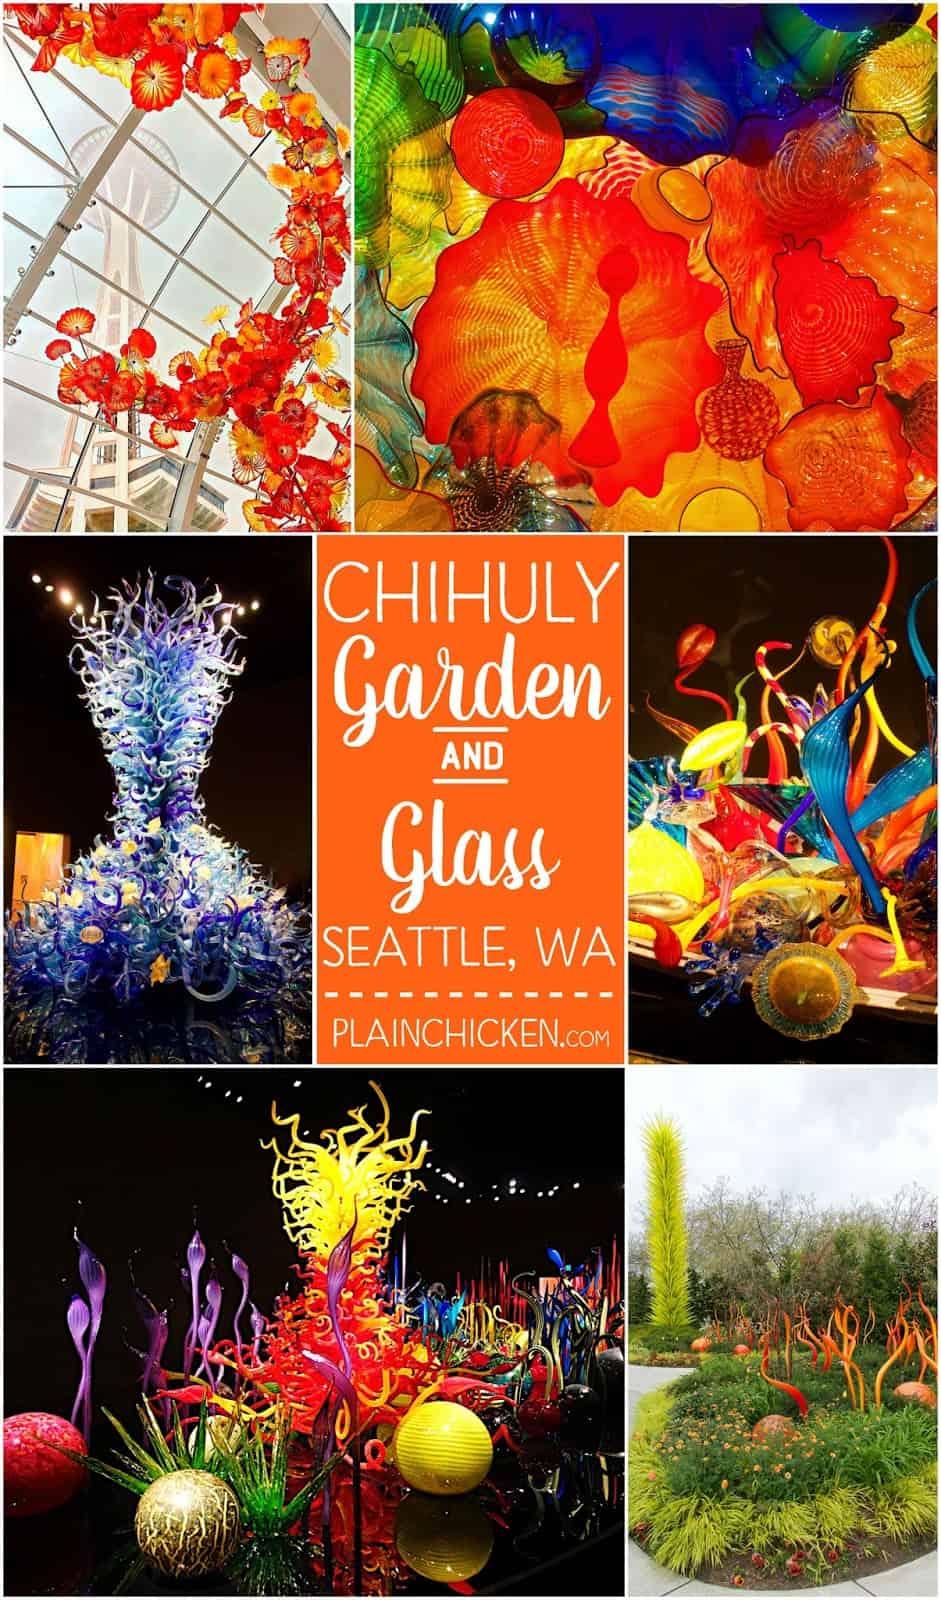 Chihuly Garden And Glass Seattle Wa Plain Chicken In 2020 Chihuly Glass Art Projects Broken Glass Art